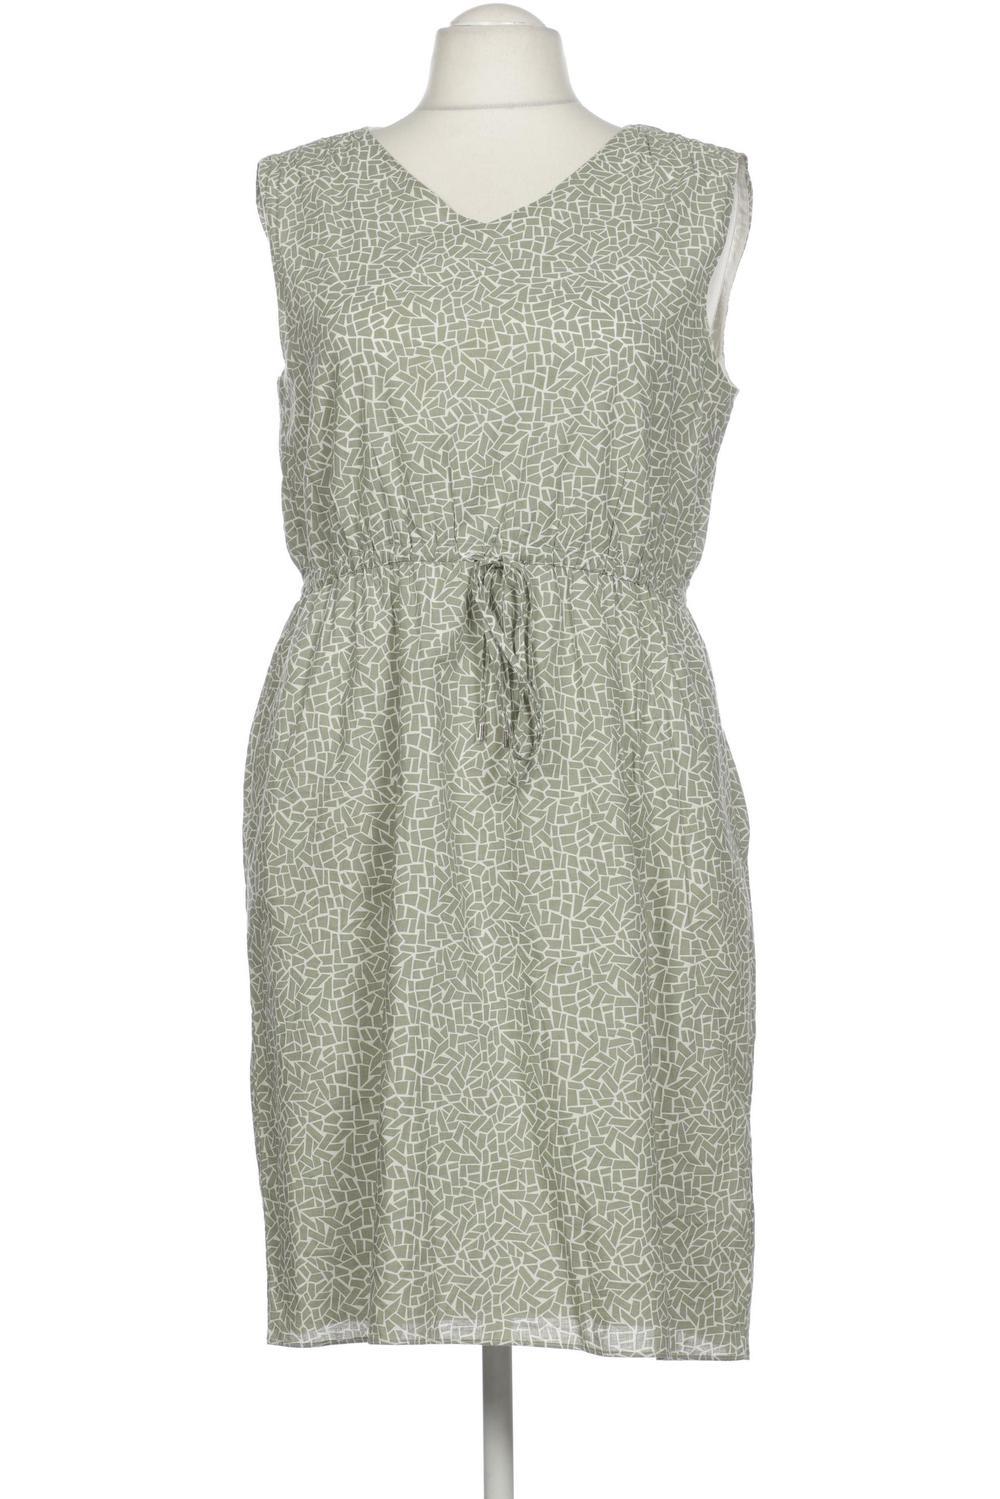 details zu hess natur kleid damen dress damenkleid gr. de 42 baumwolle grün  81bdebc